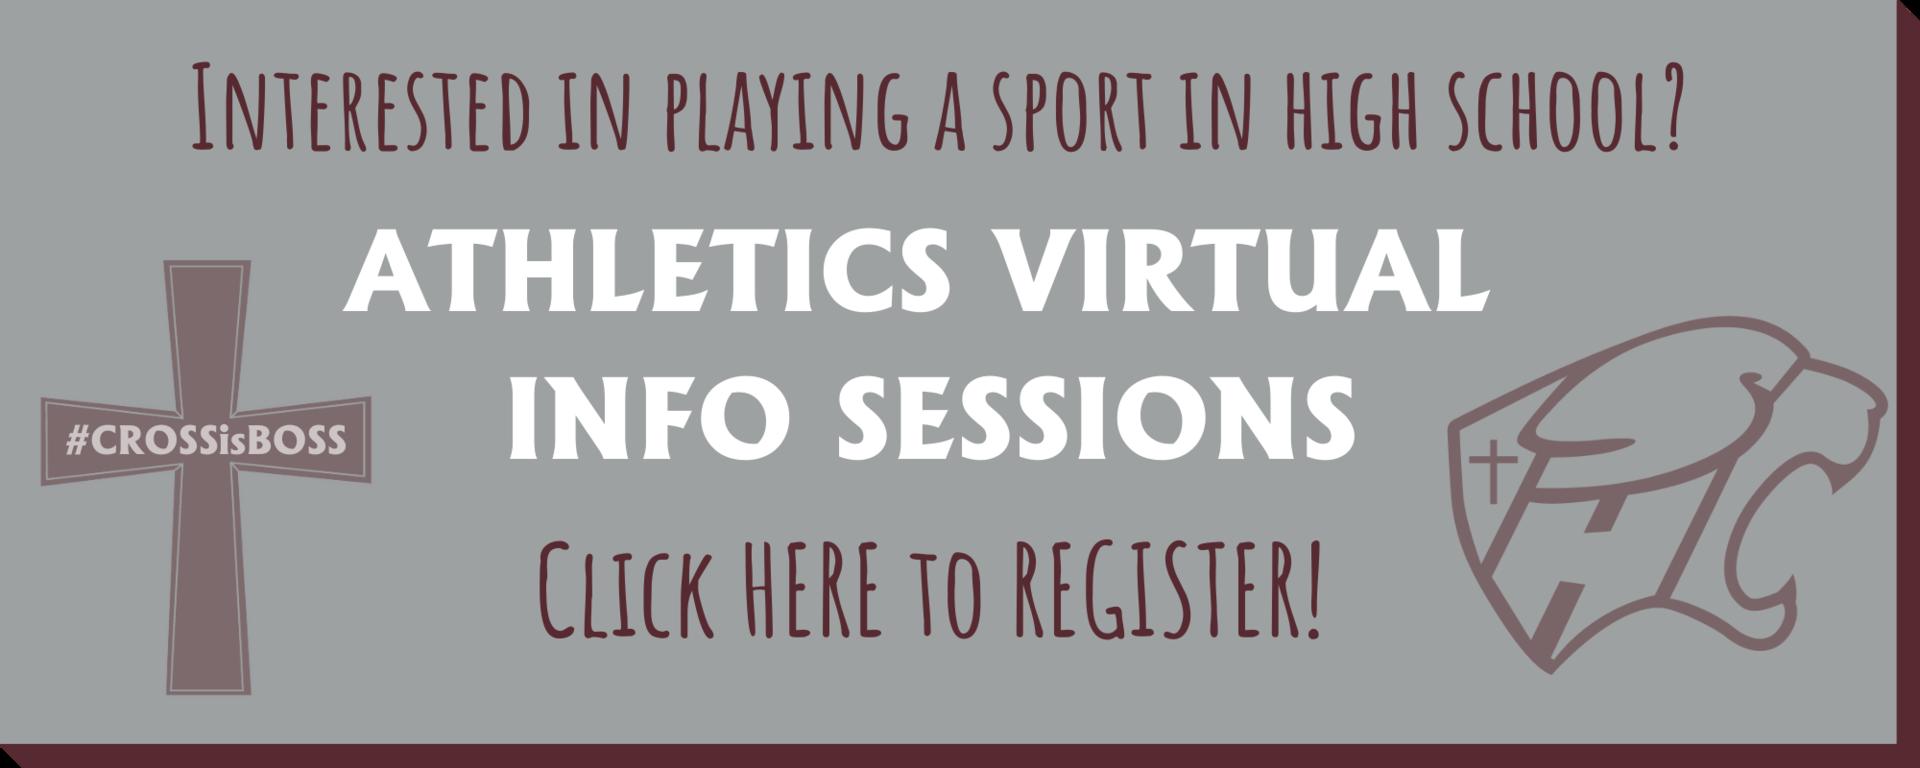 Athletics Info Sessions